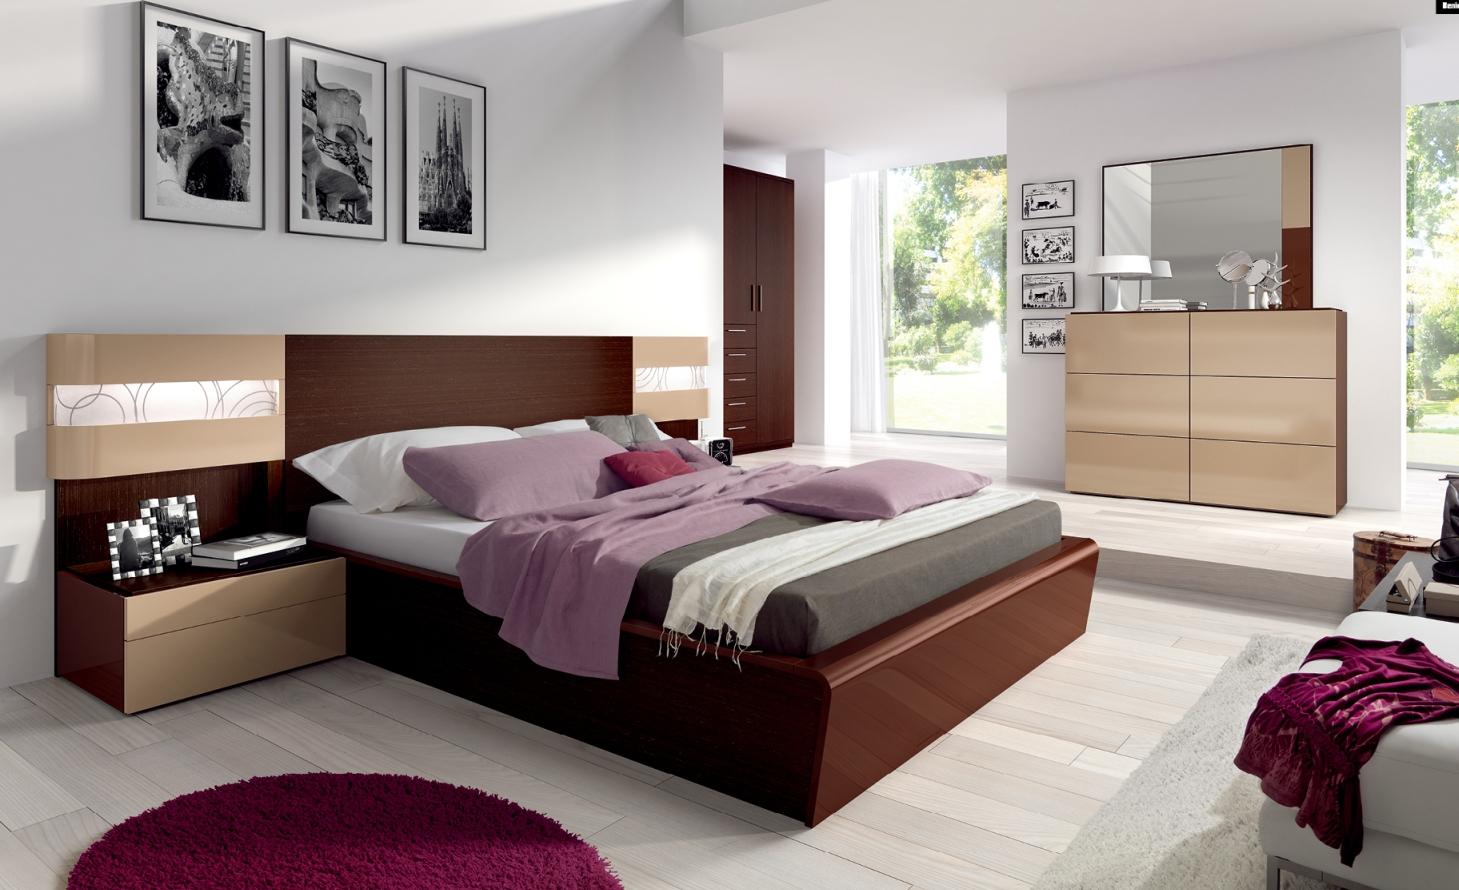 20 Bedroom Ideas In Kenya By Digital Interiors Digital Interiors